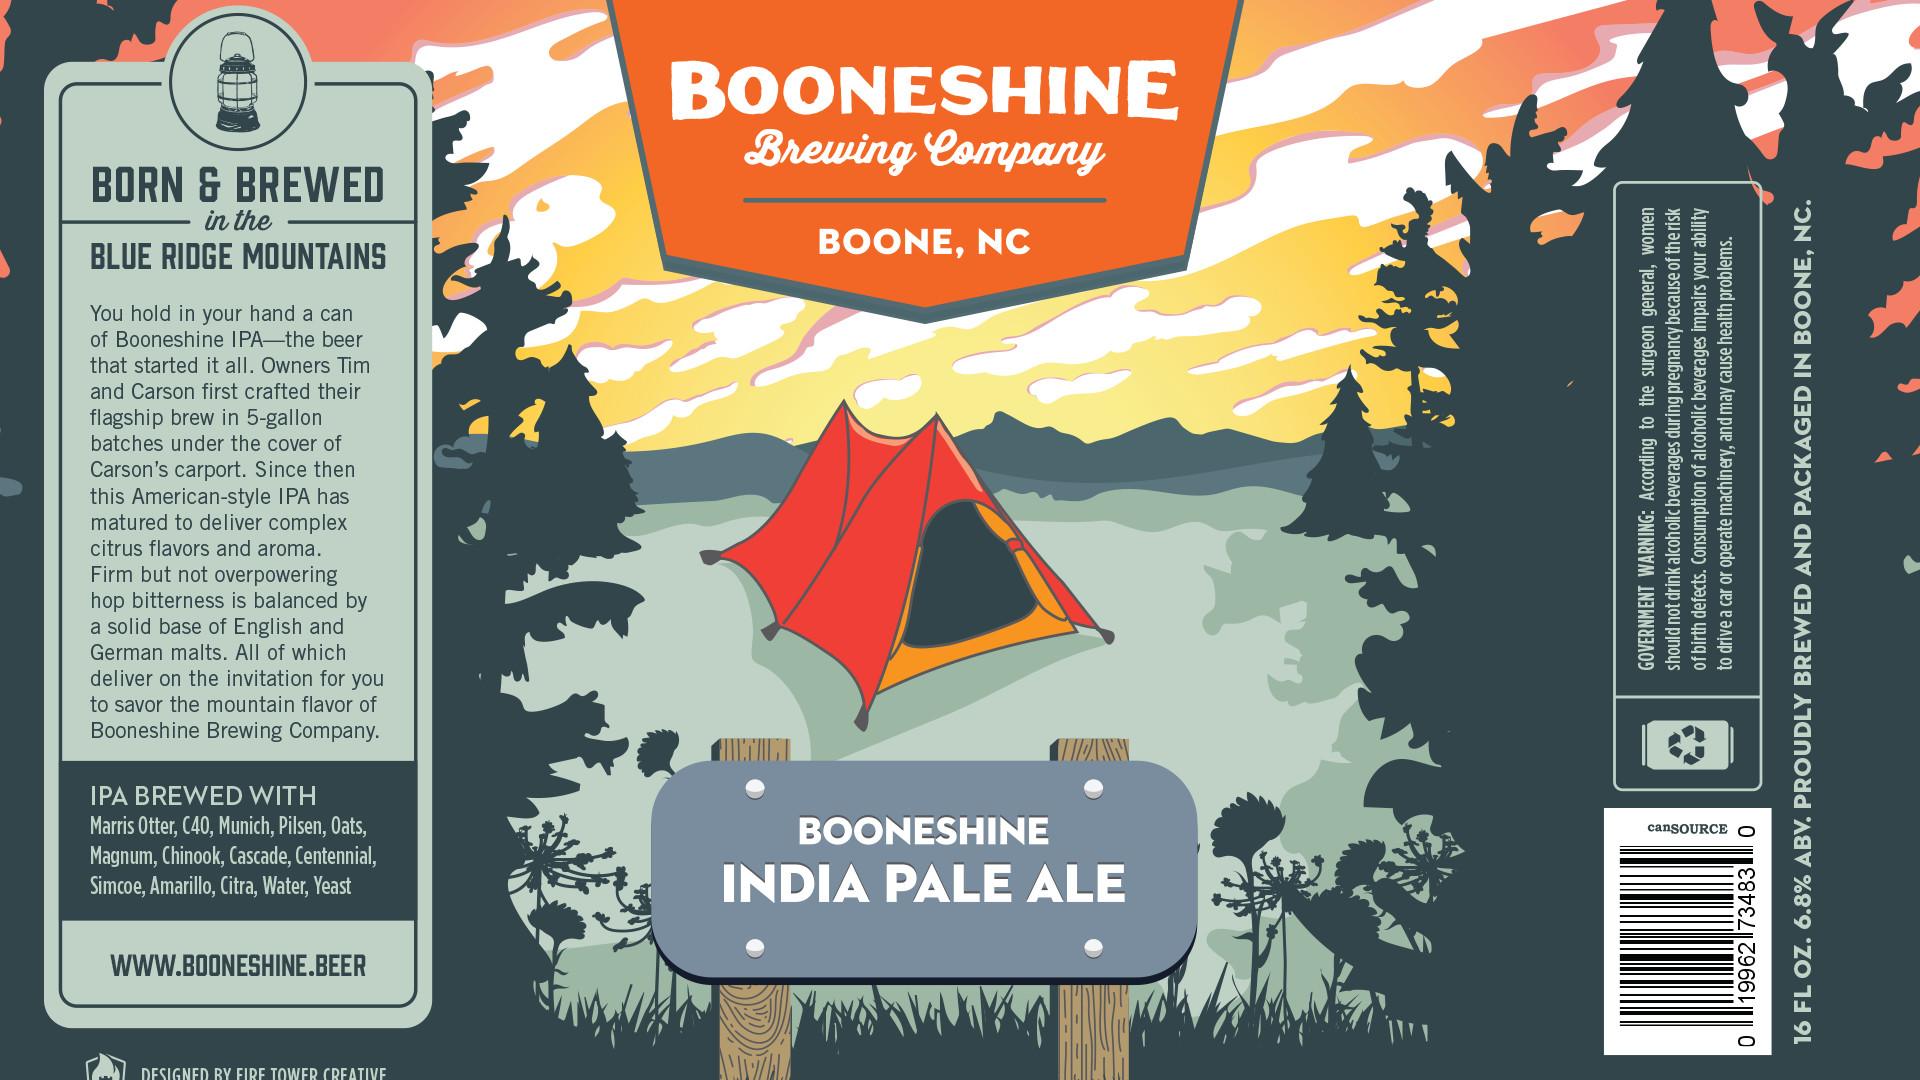 Booneshine+IPA+16oz+flat+label.jpg